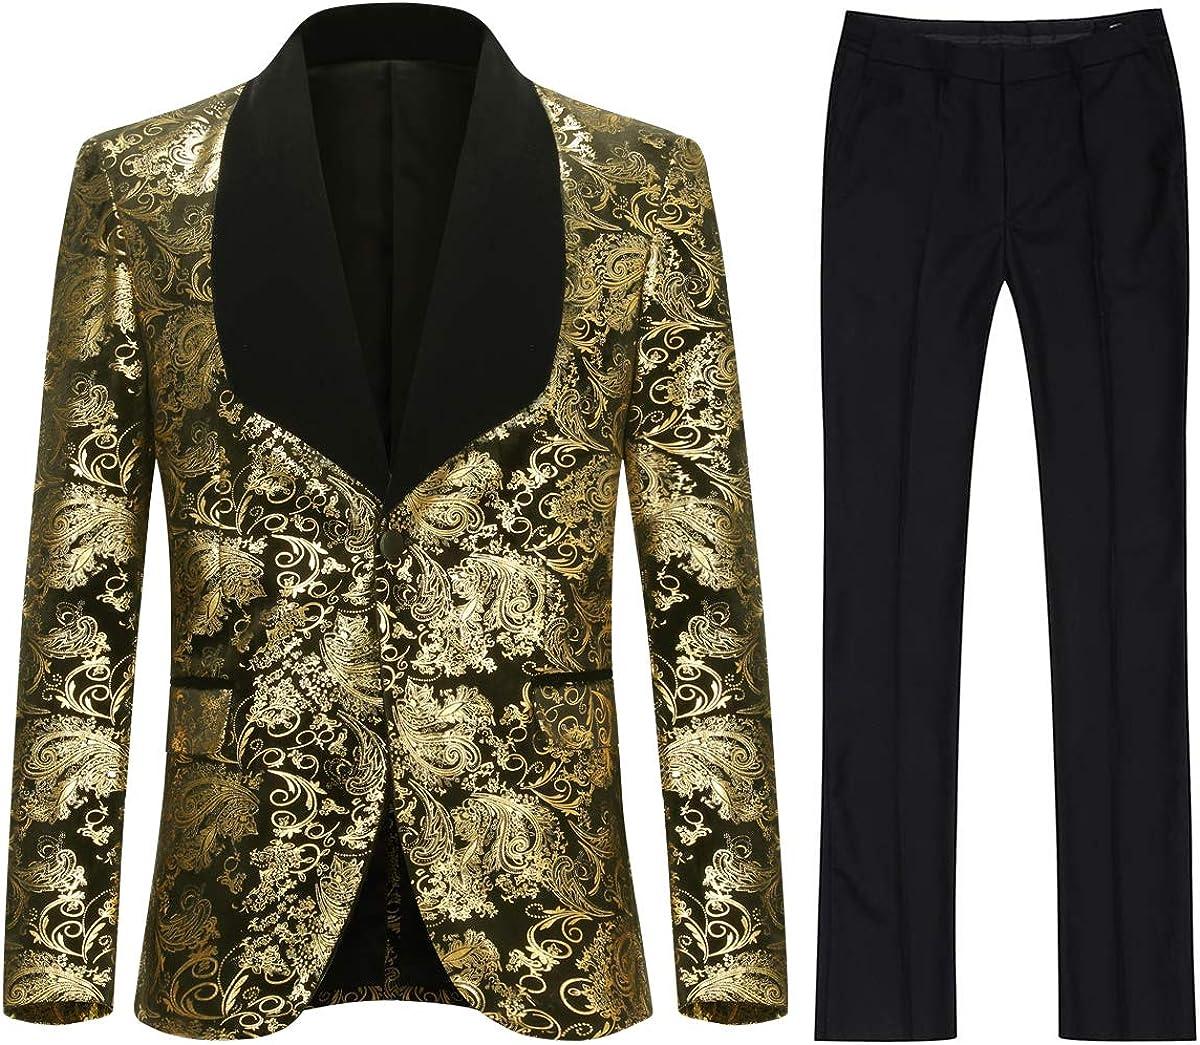 Mens Dress Suit 2 Piece 1 Button Gold Printed Wedding Prom Party Blazer Pants Set